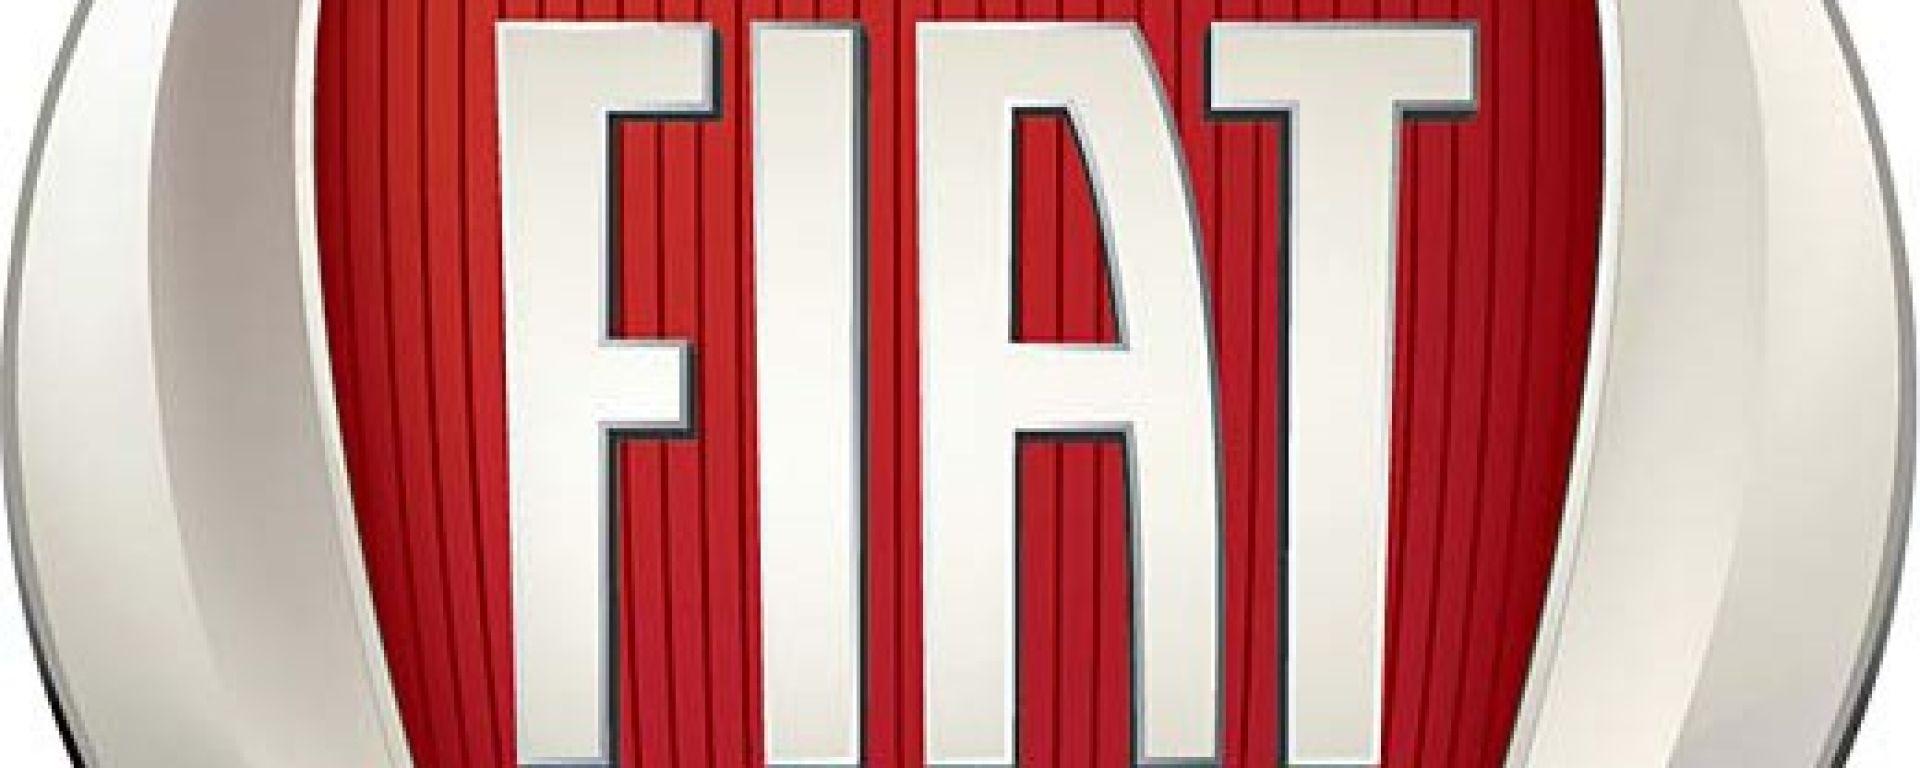 Fiat riparte dal logo